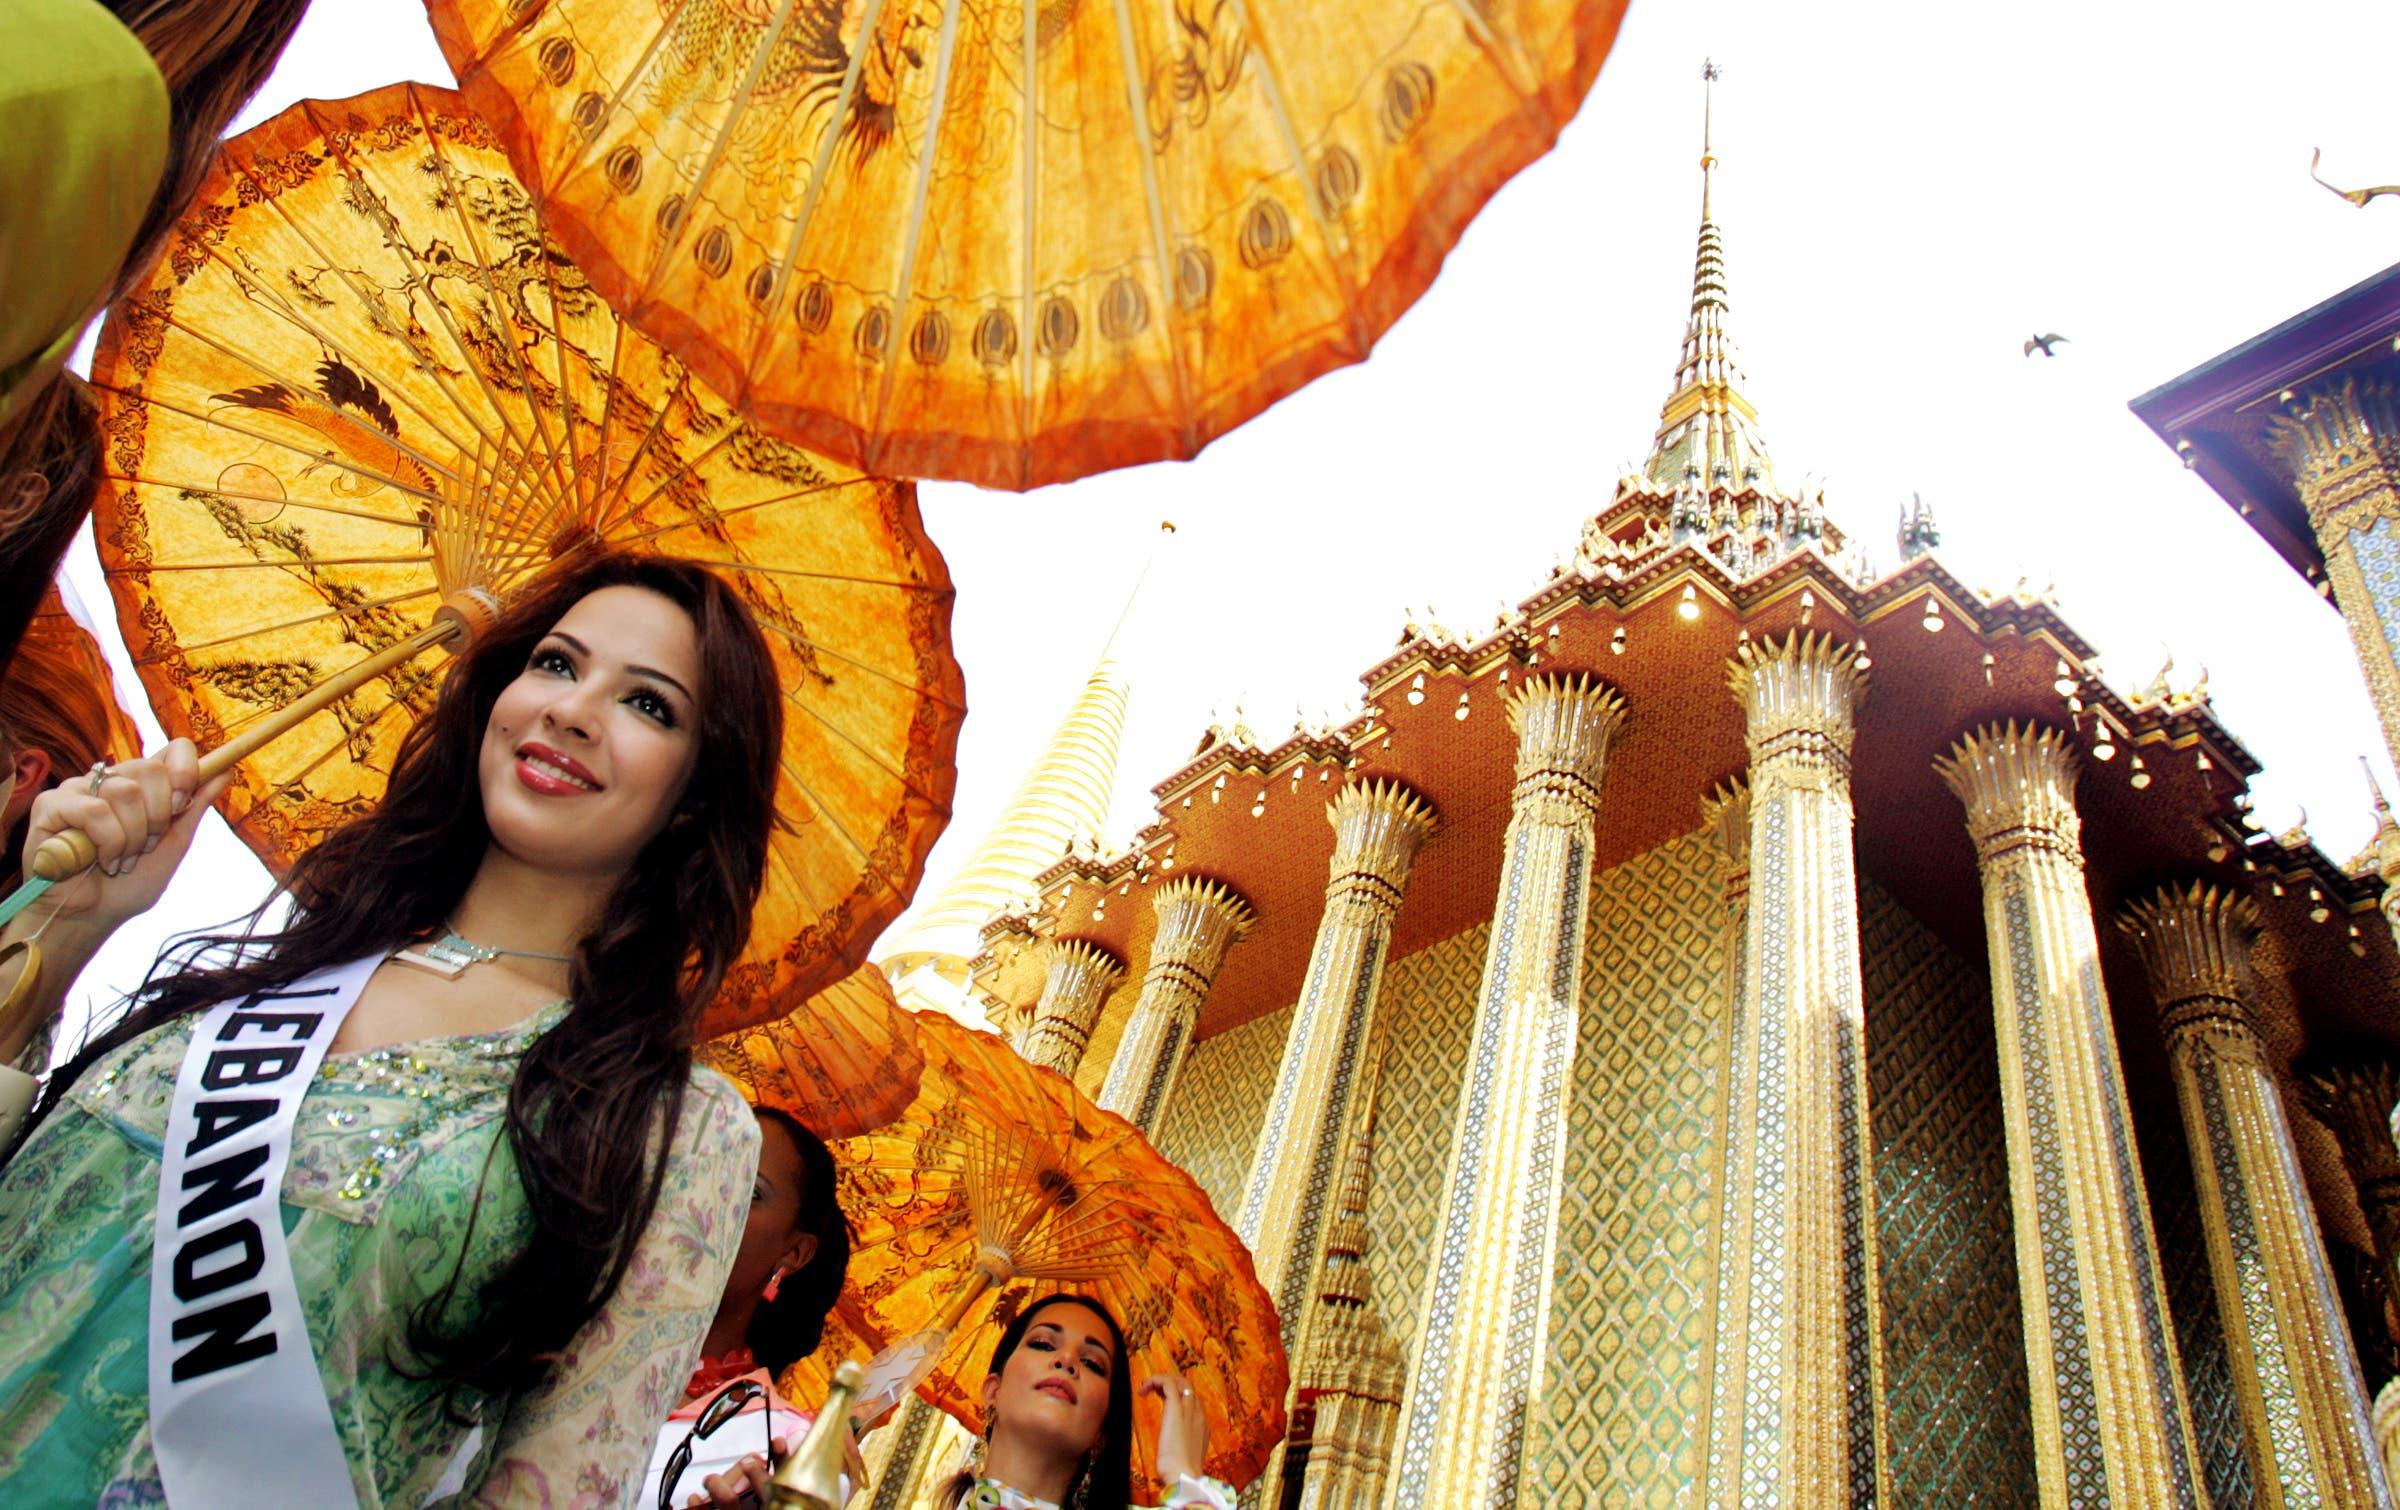 Miss Nadine Njeim was crowned Miss Lebanon 2004. (Reuters)